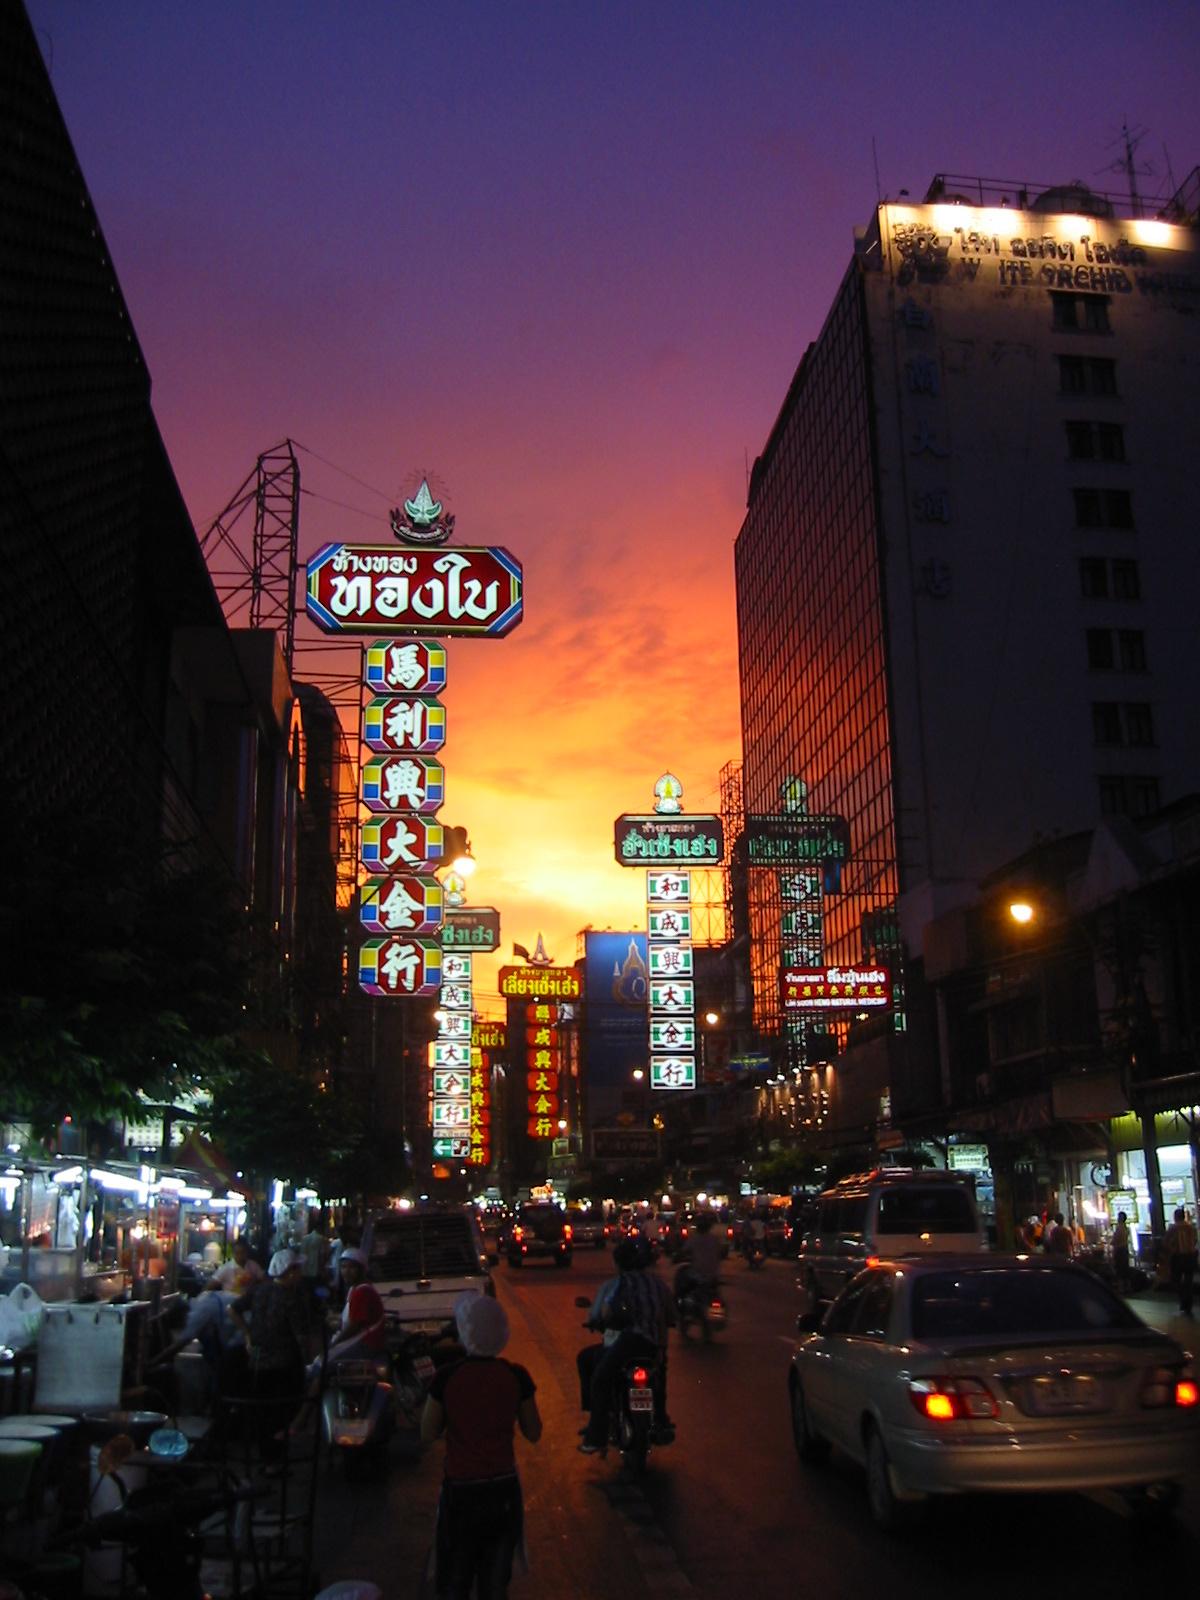 Sunset River Cruise + Chinatown